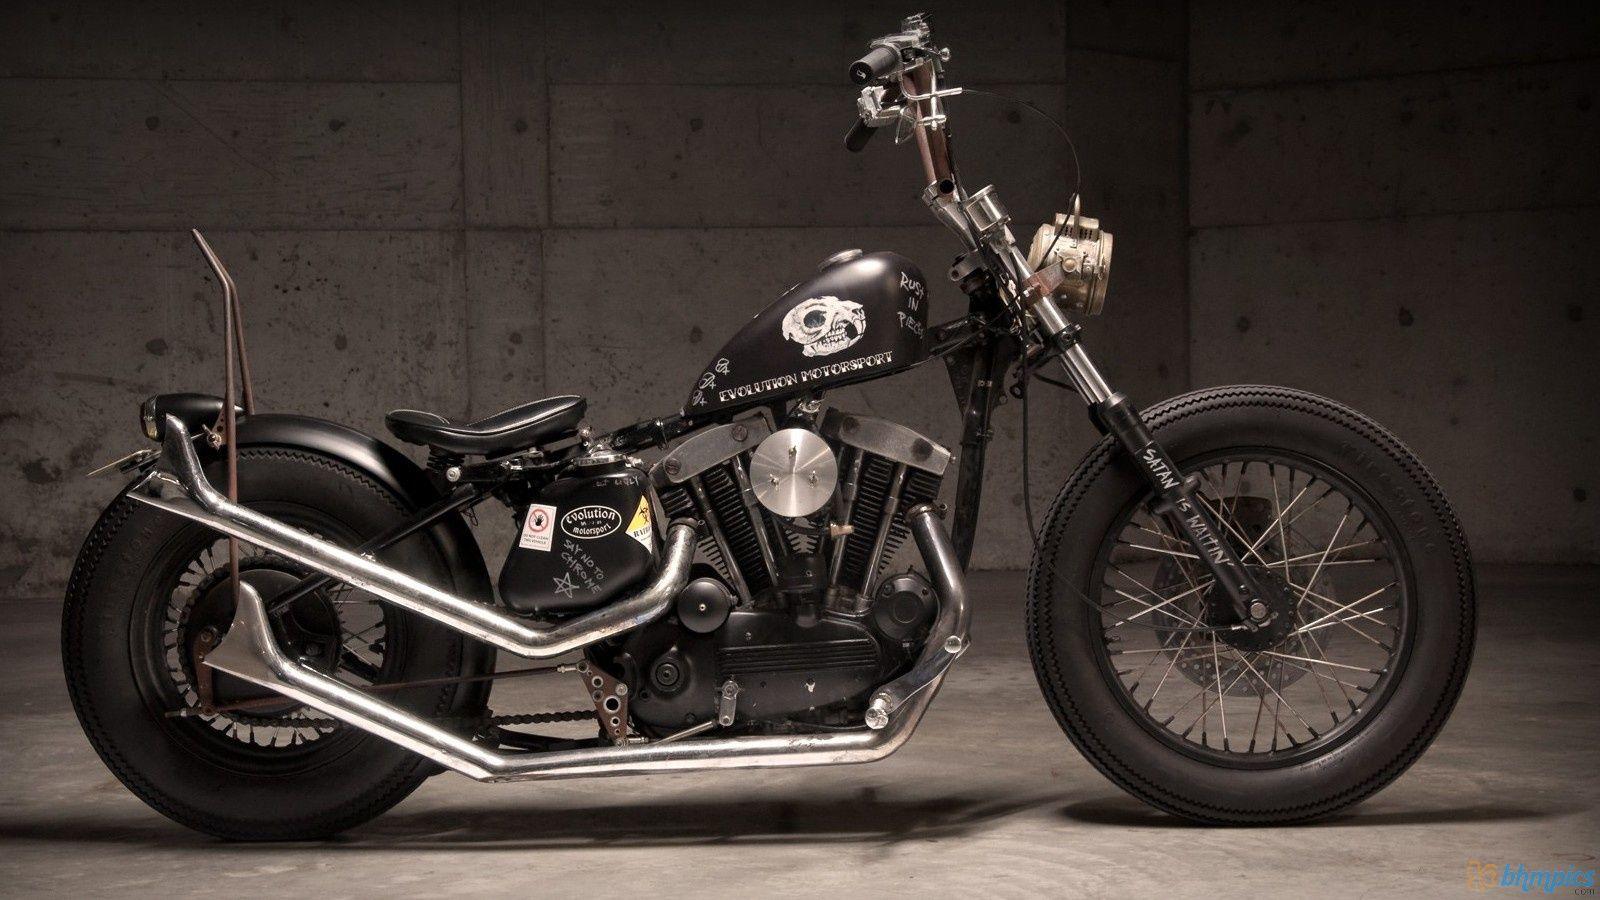 Bobber Cafe Racer Harley Davidson Hd Wallpaper 1080p: 1969_harley_rat_bobber-1600x900.jpg (1600×900)